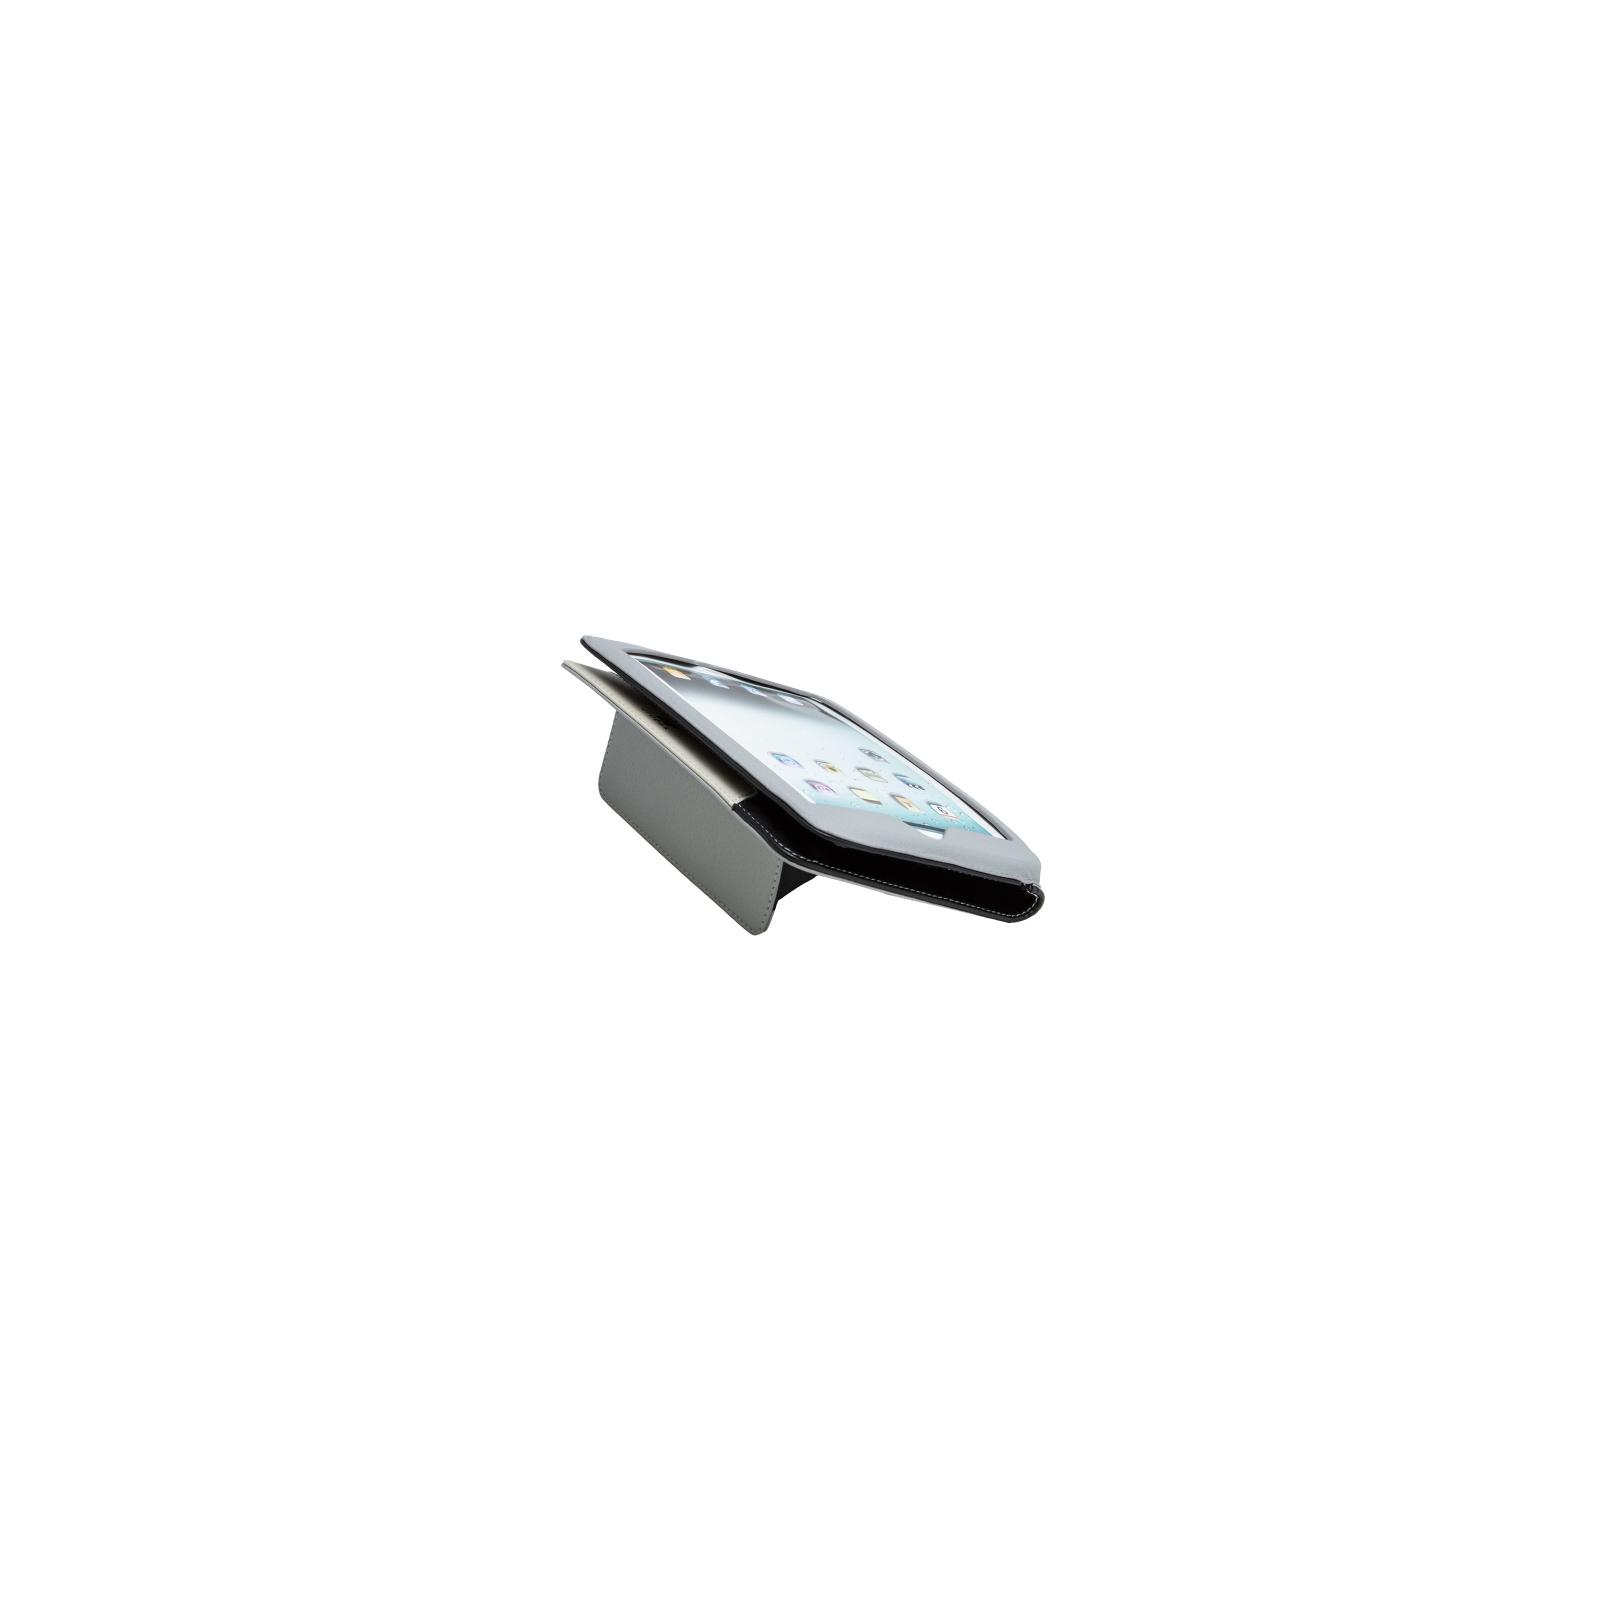 Чехол для планшета Drobak 7.9 Apple iPad mini /Comfort Style/Black (210247) изображение 3